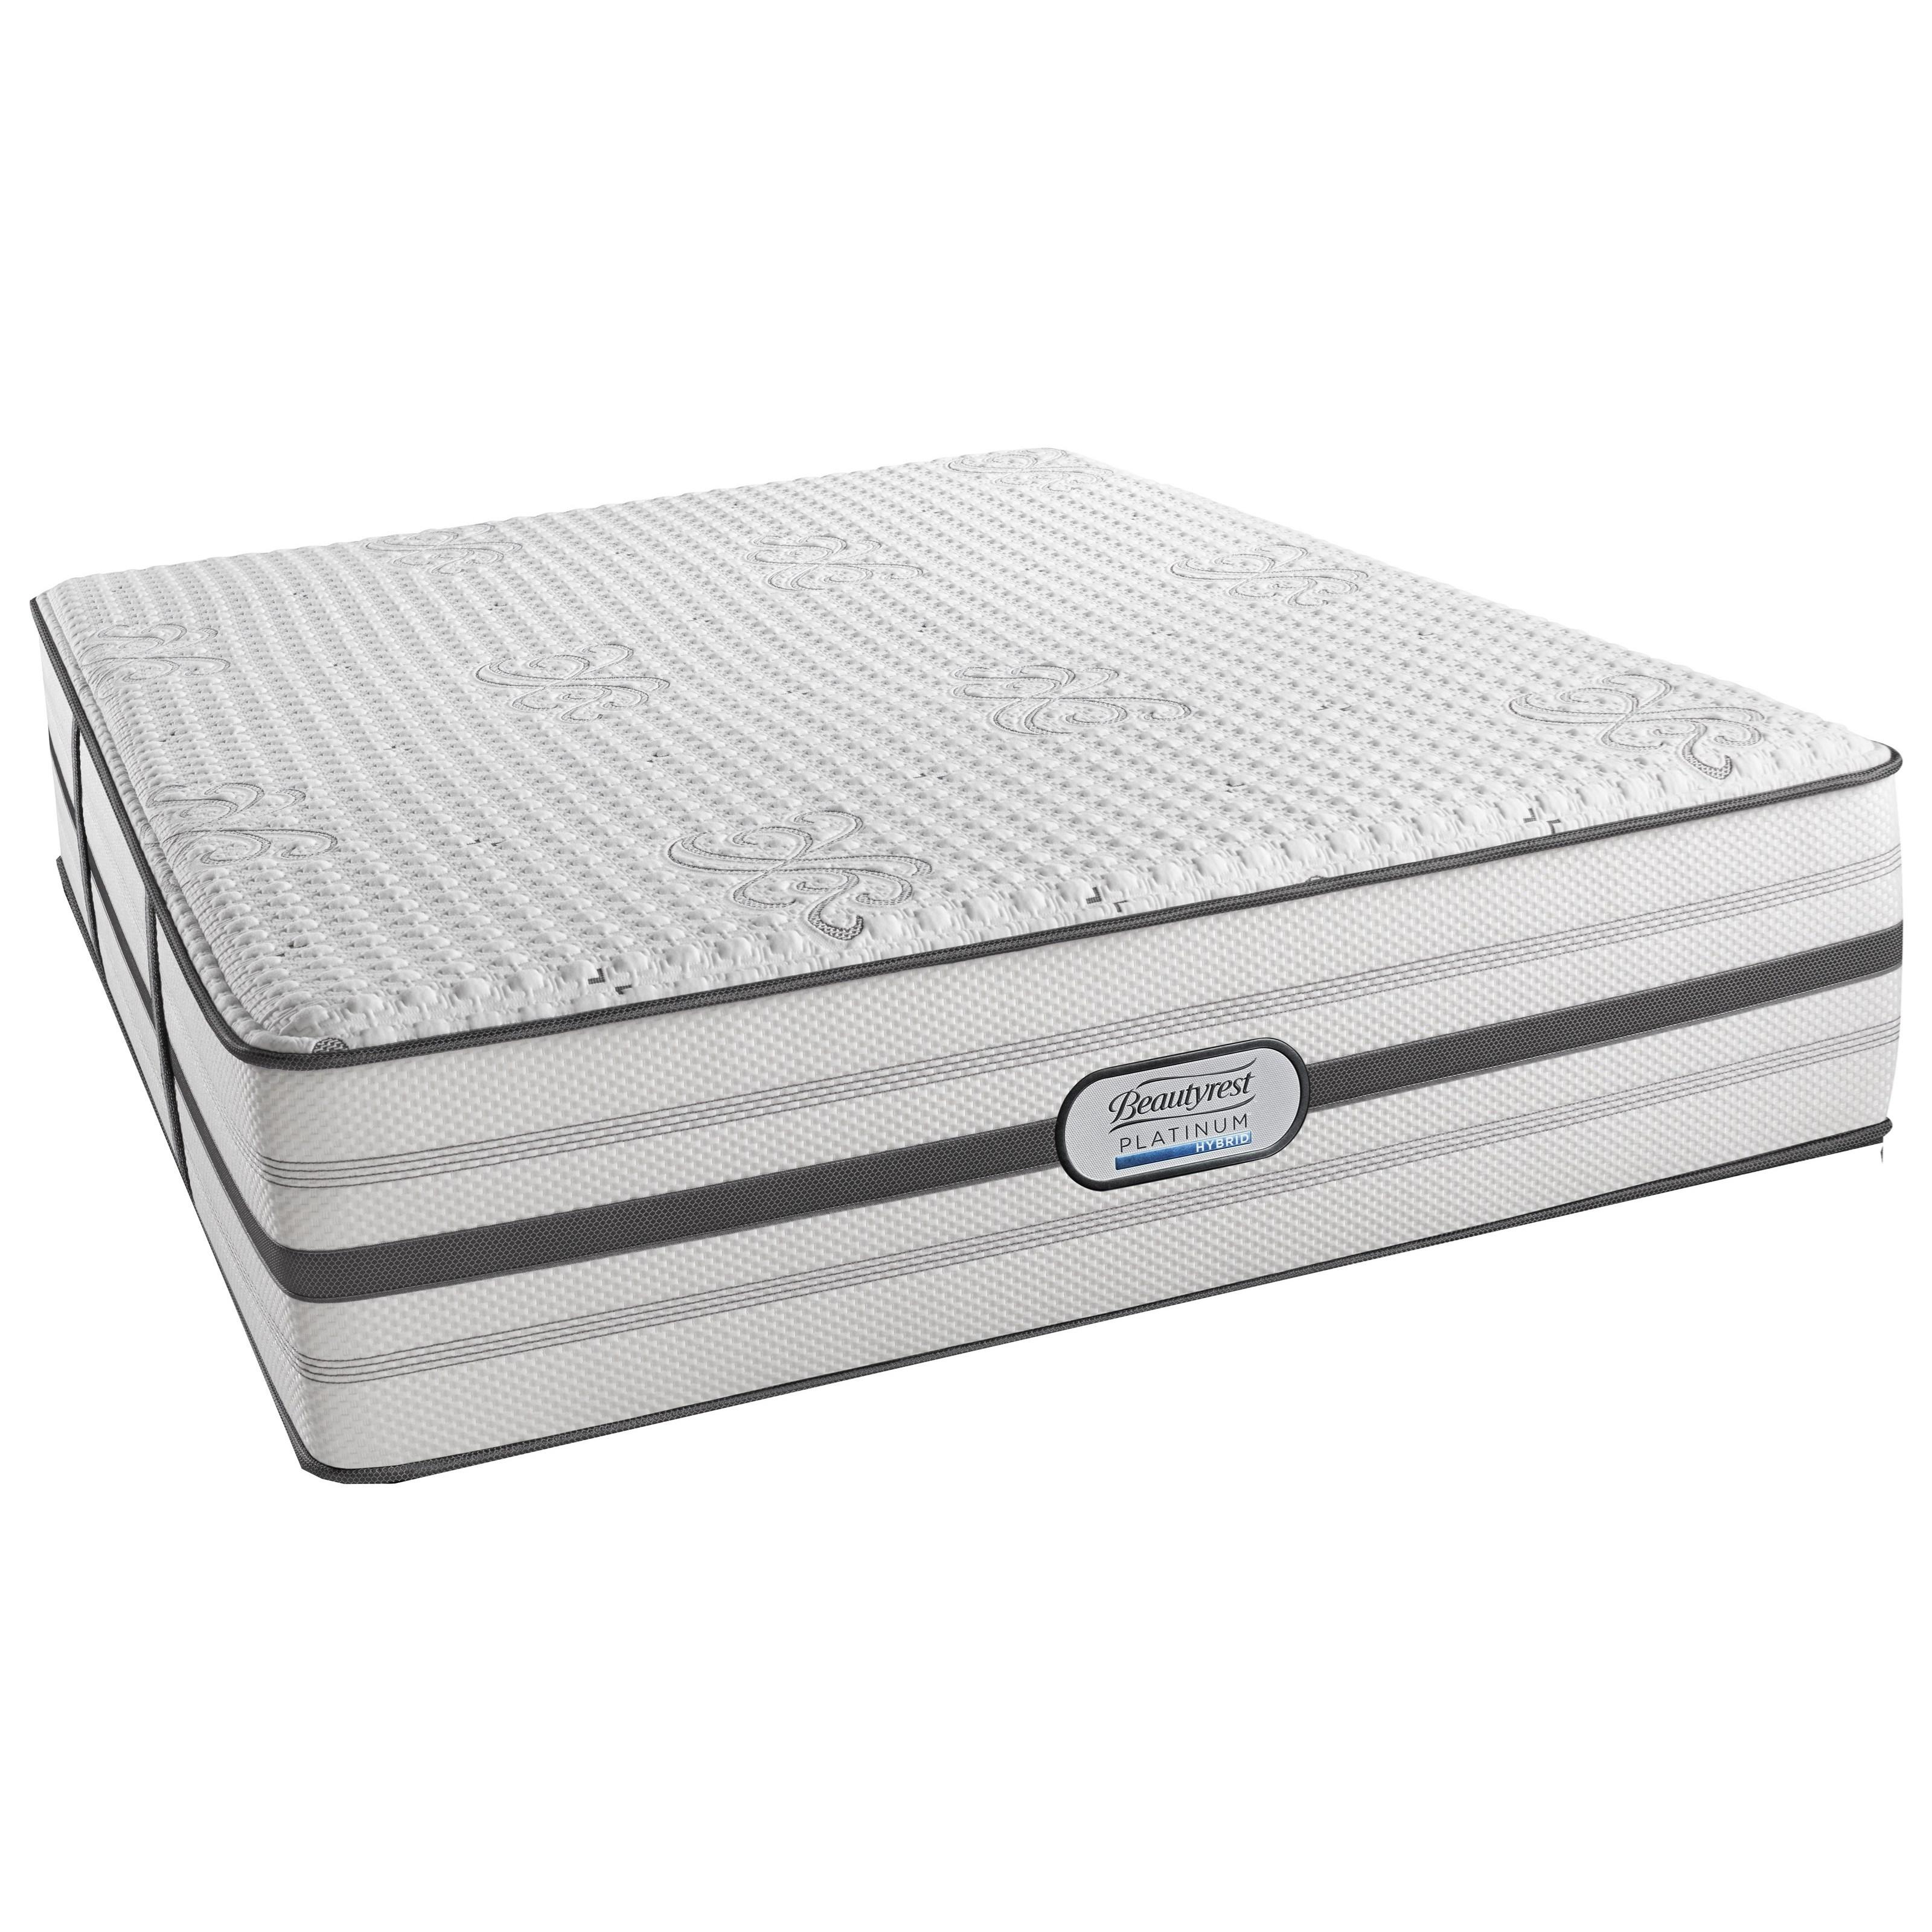 Beautyrest Platinum Hybrid Quinn Cal King Ultra Plush Adjustable Set - Item Number: BRHLV4UPL-CK+2xSM2-SPCK